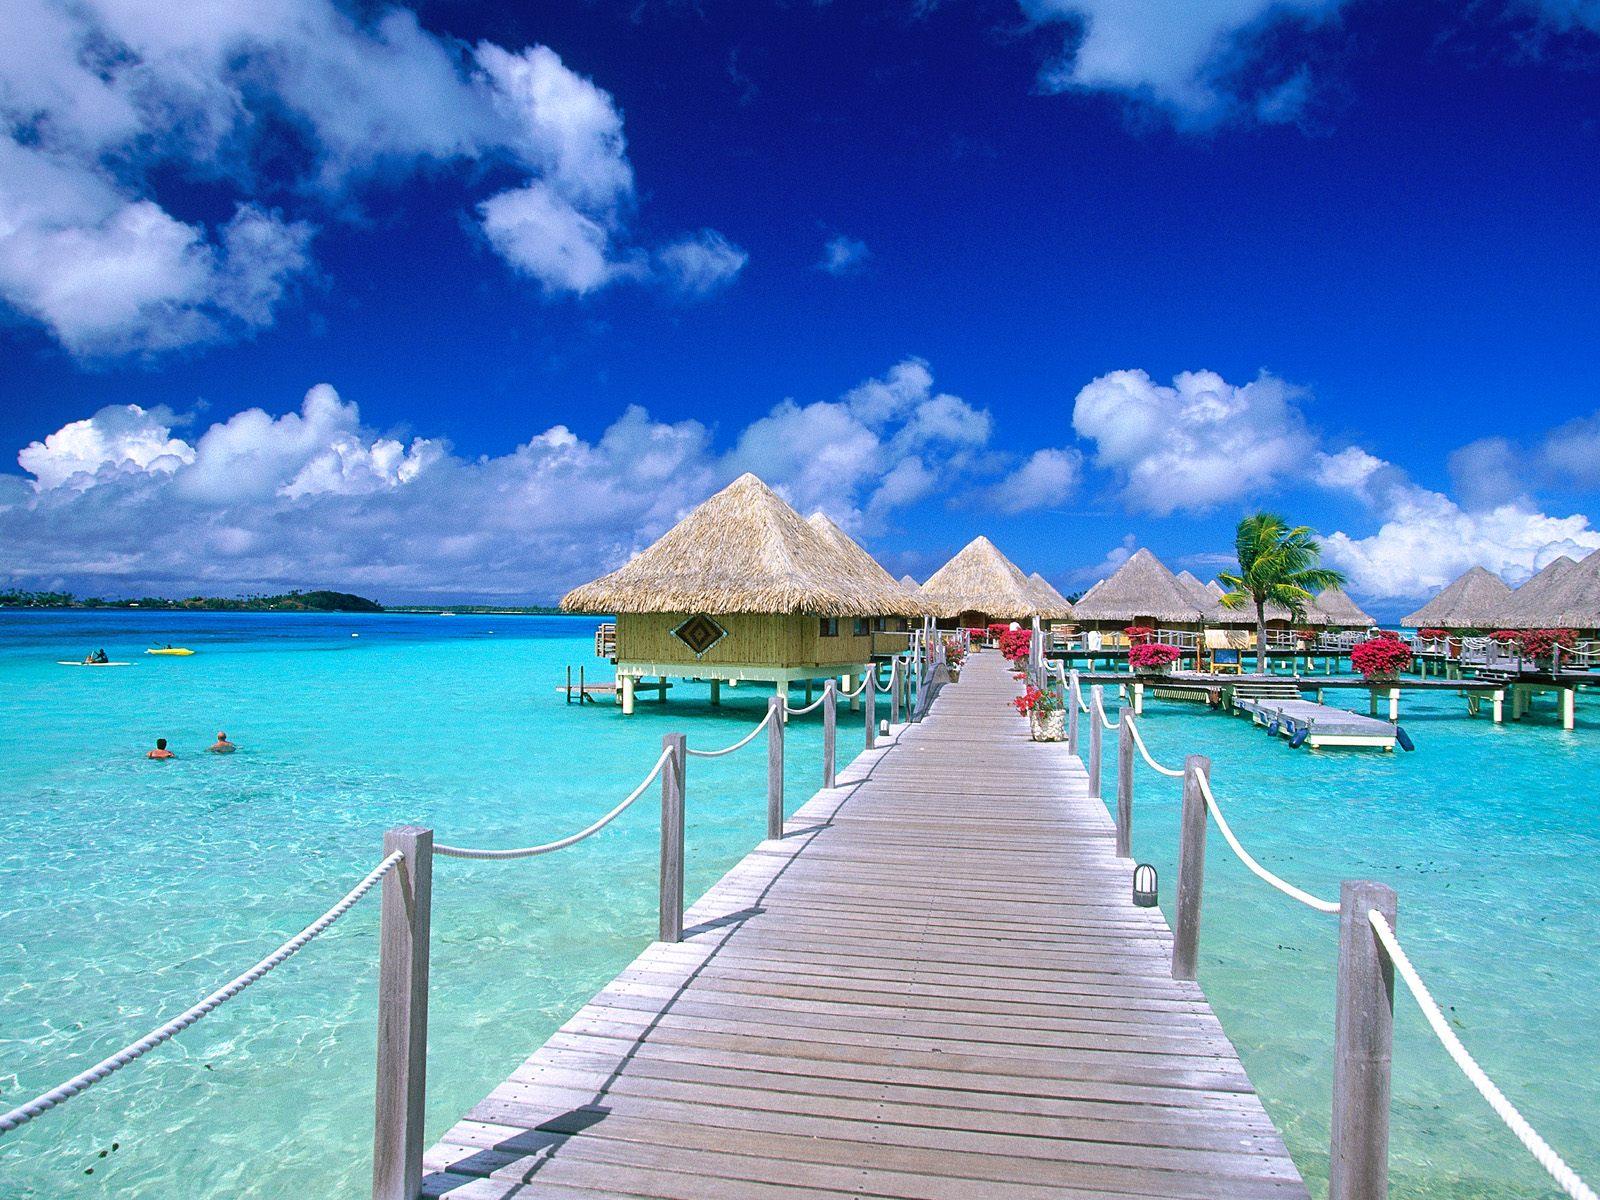 http://3.bp.blogspot.com/-e4gvmxTVMHg/TcQk87ebTsI/AAAAAAAAADU/mY_HNNTf17Y/s1600/matira-point-bora-bora-french-polynesia%255B1%255D.jpg